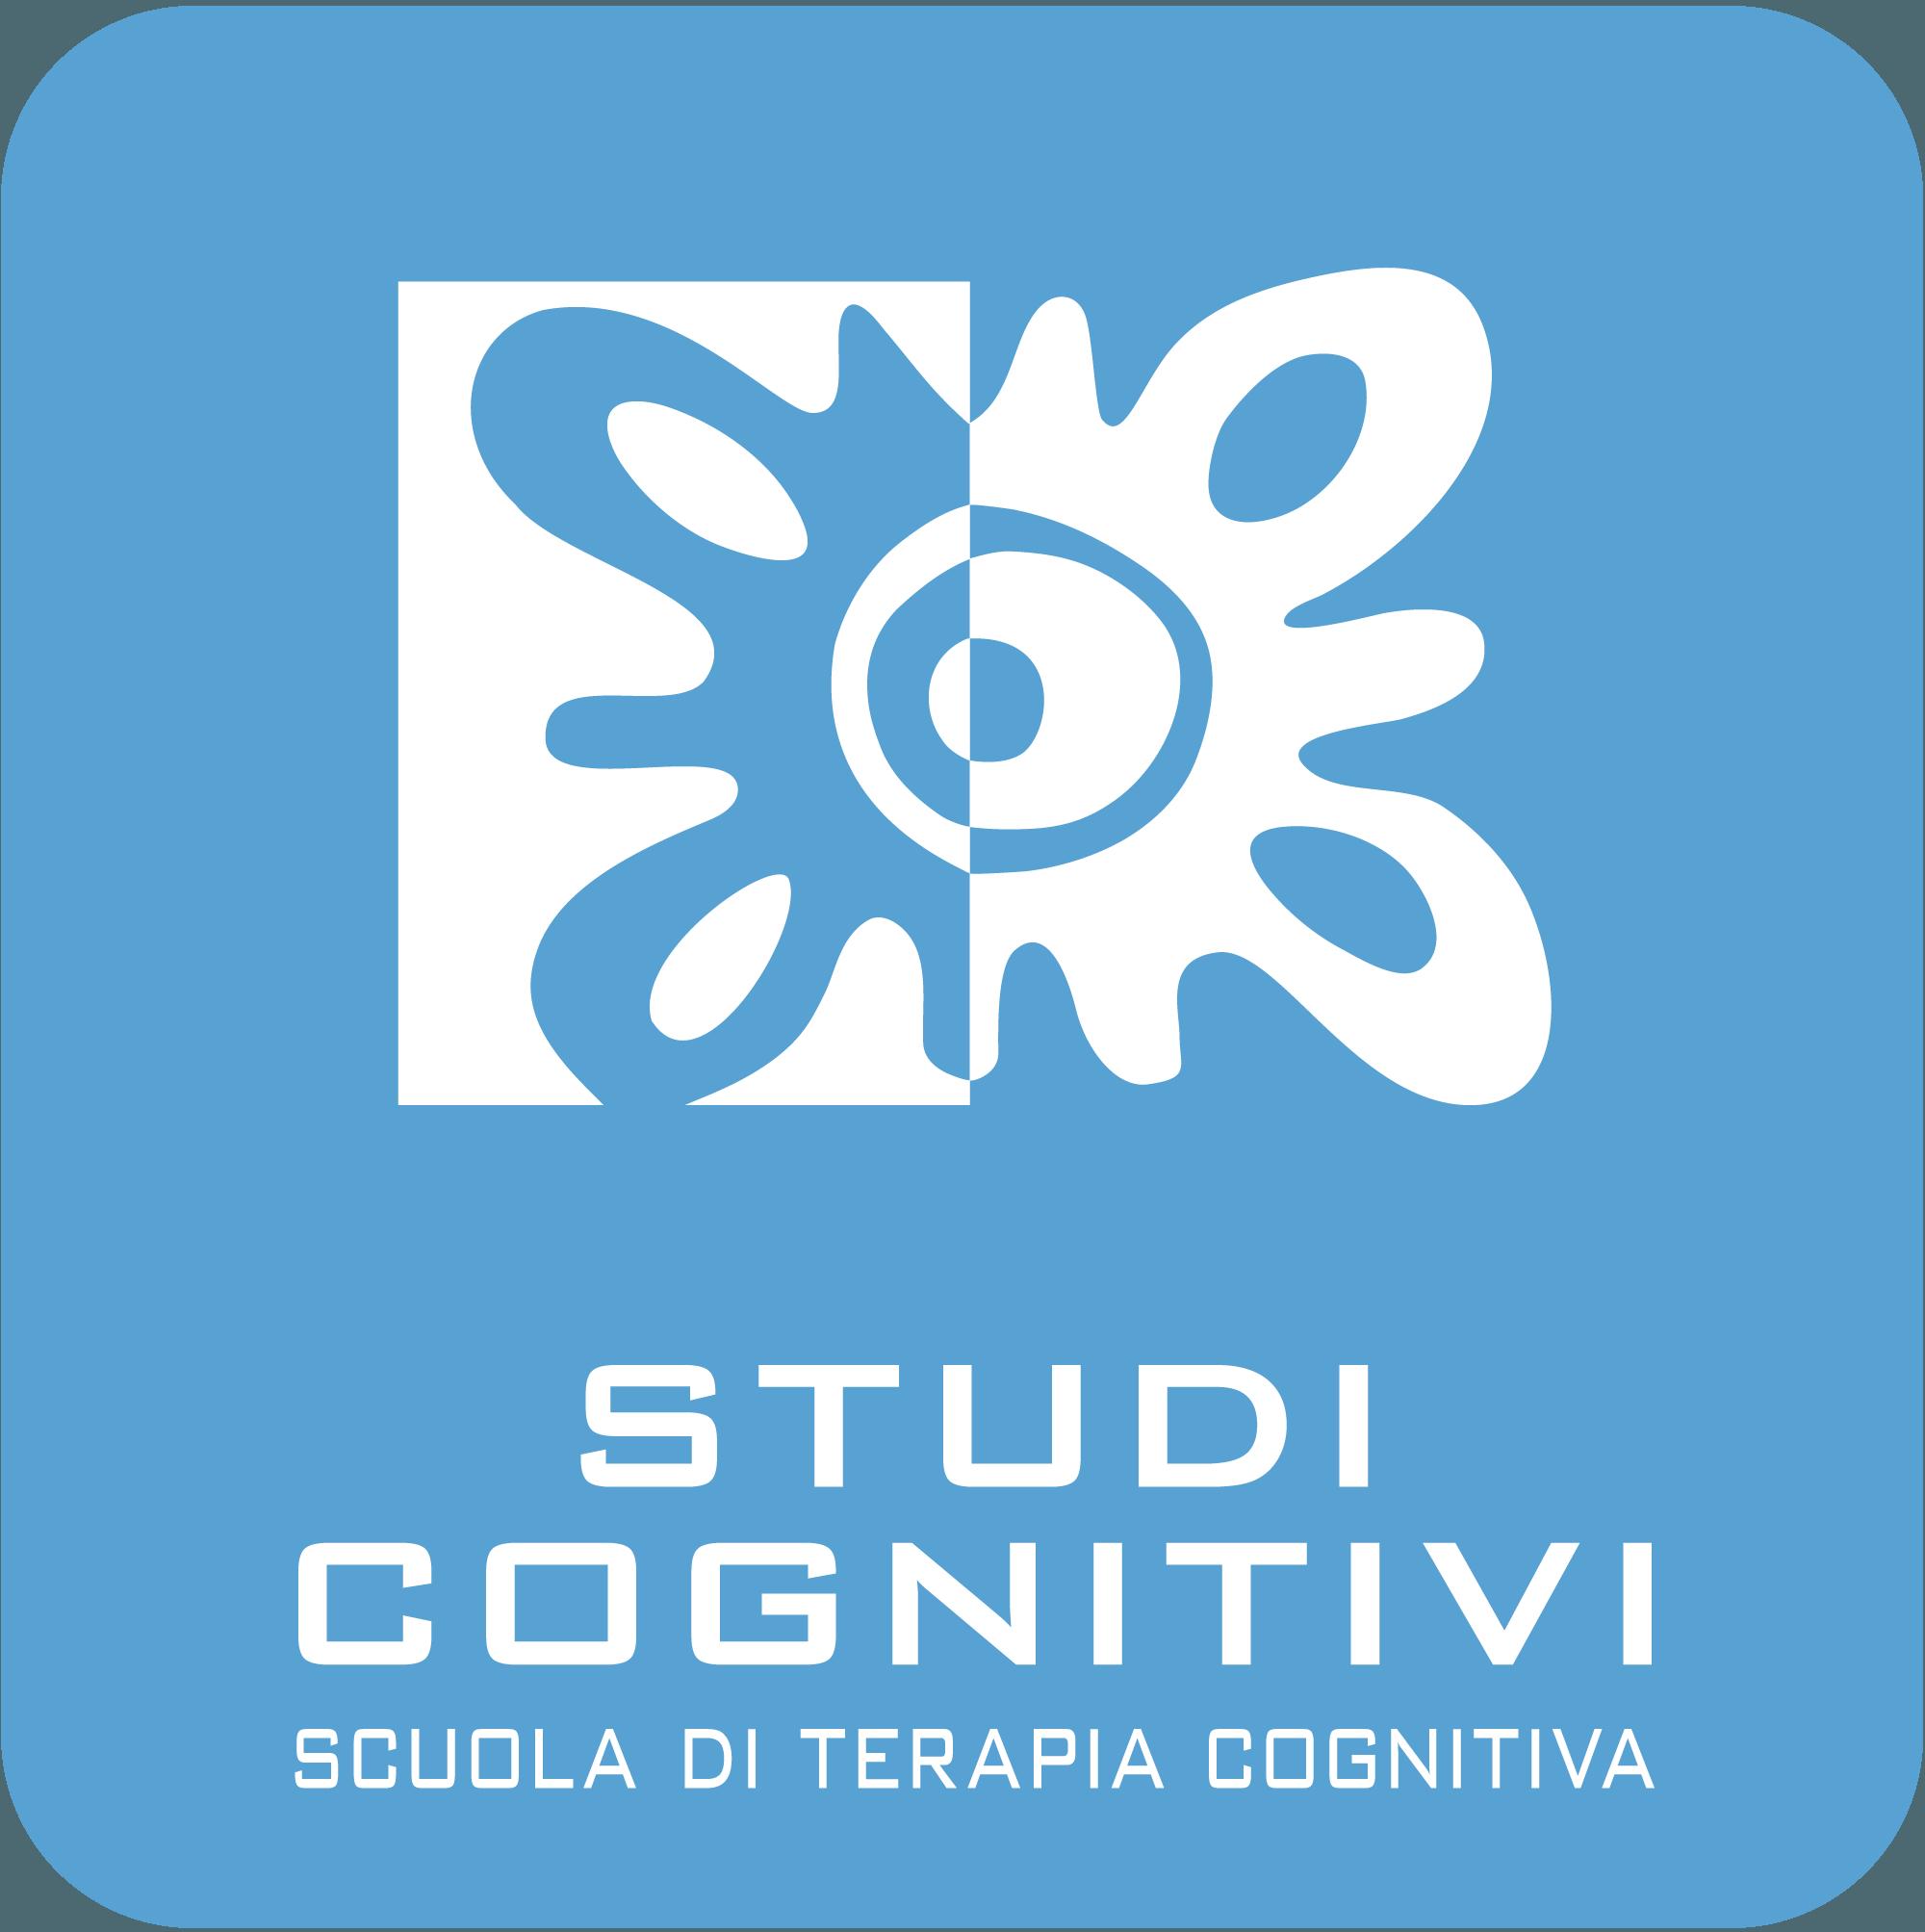 studi-cognitivi-modena-box